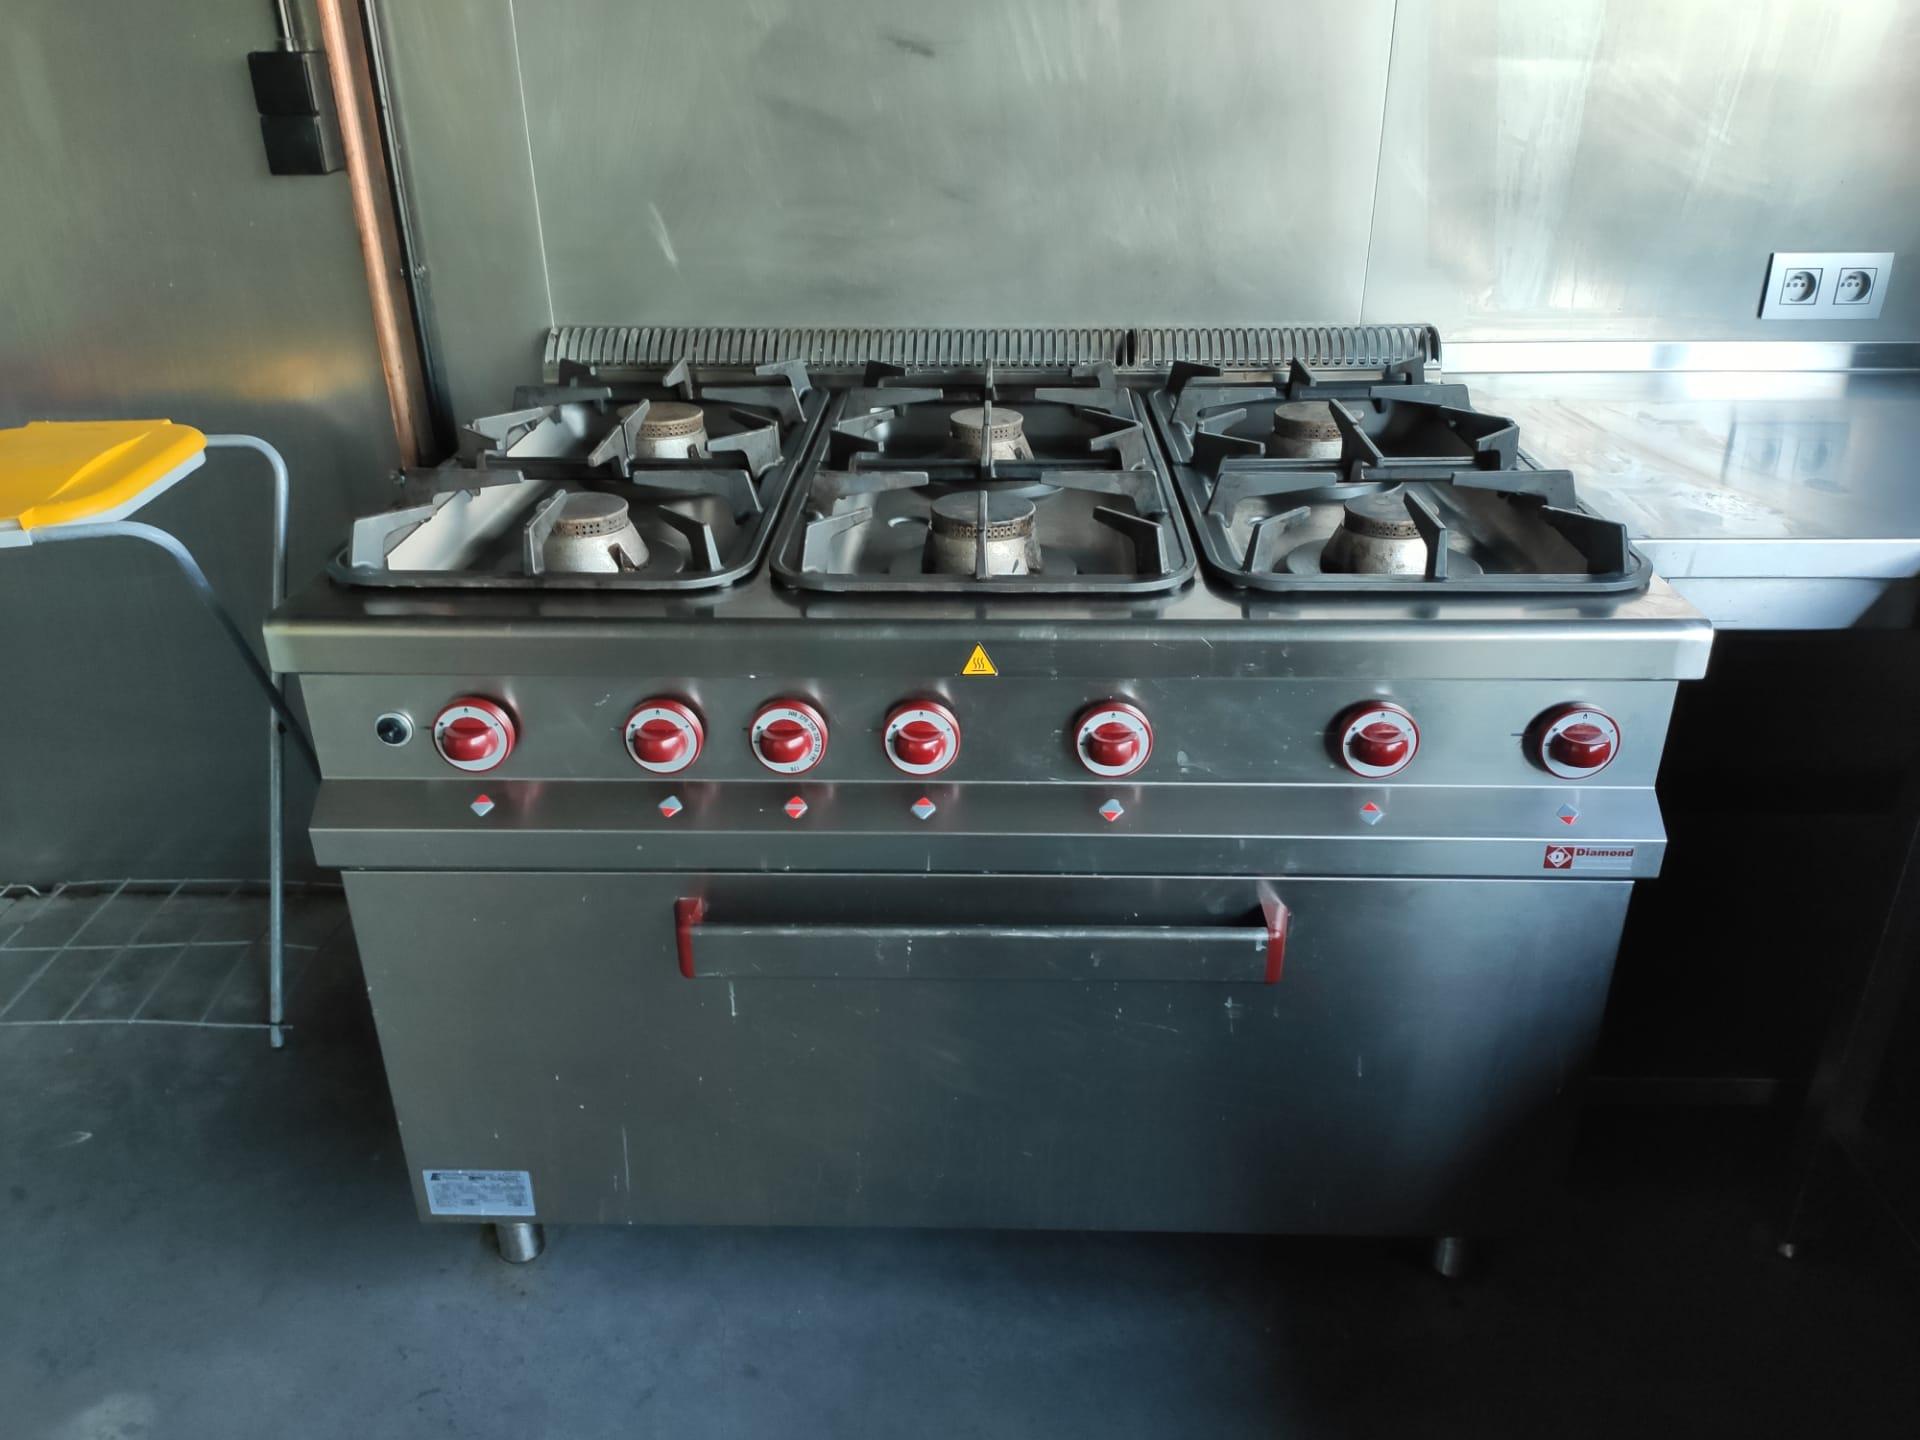 keuken (6 gasbekkens en ruime gasoven)